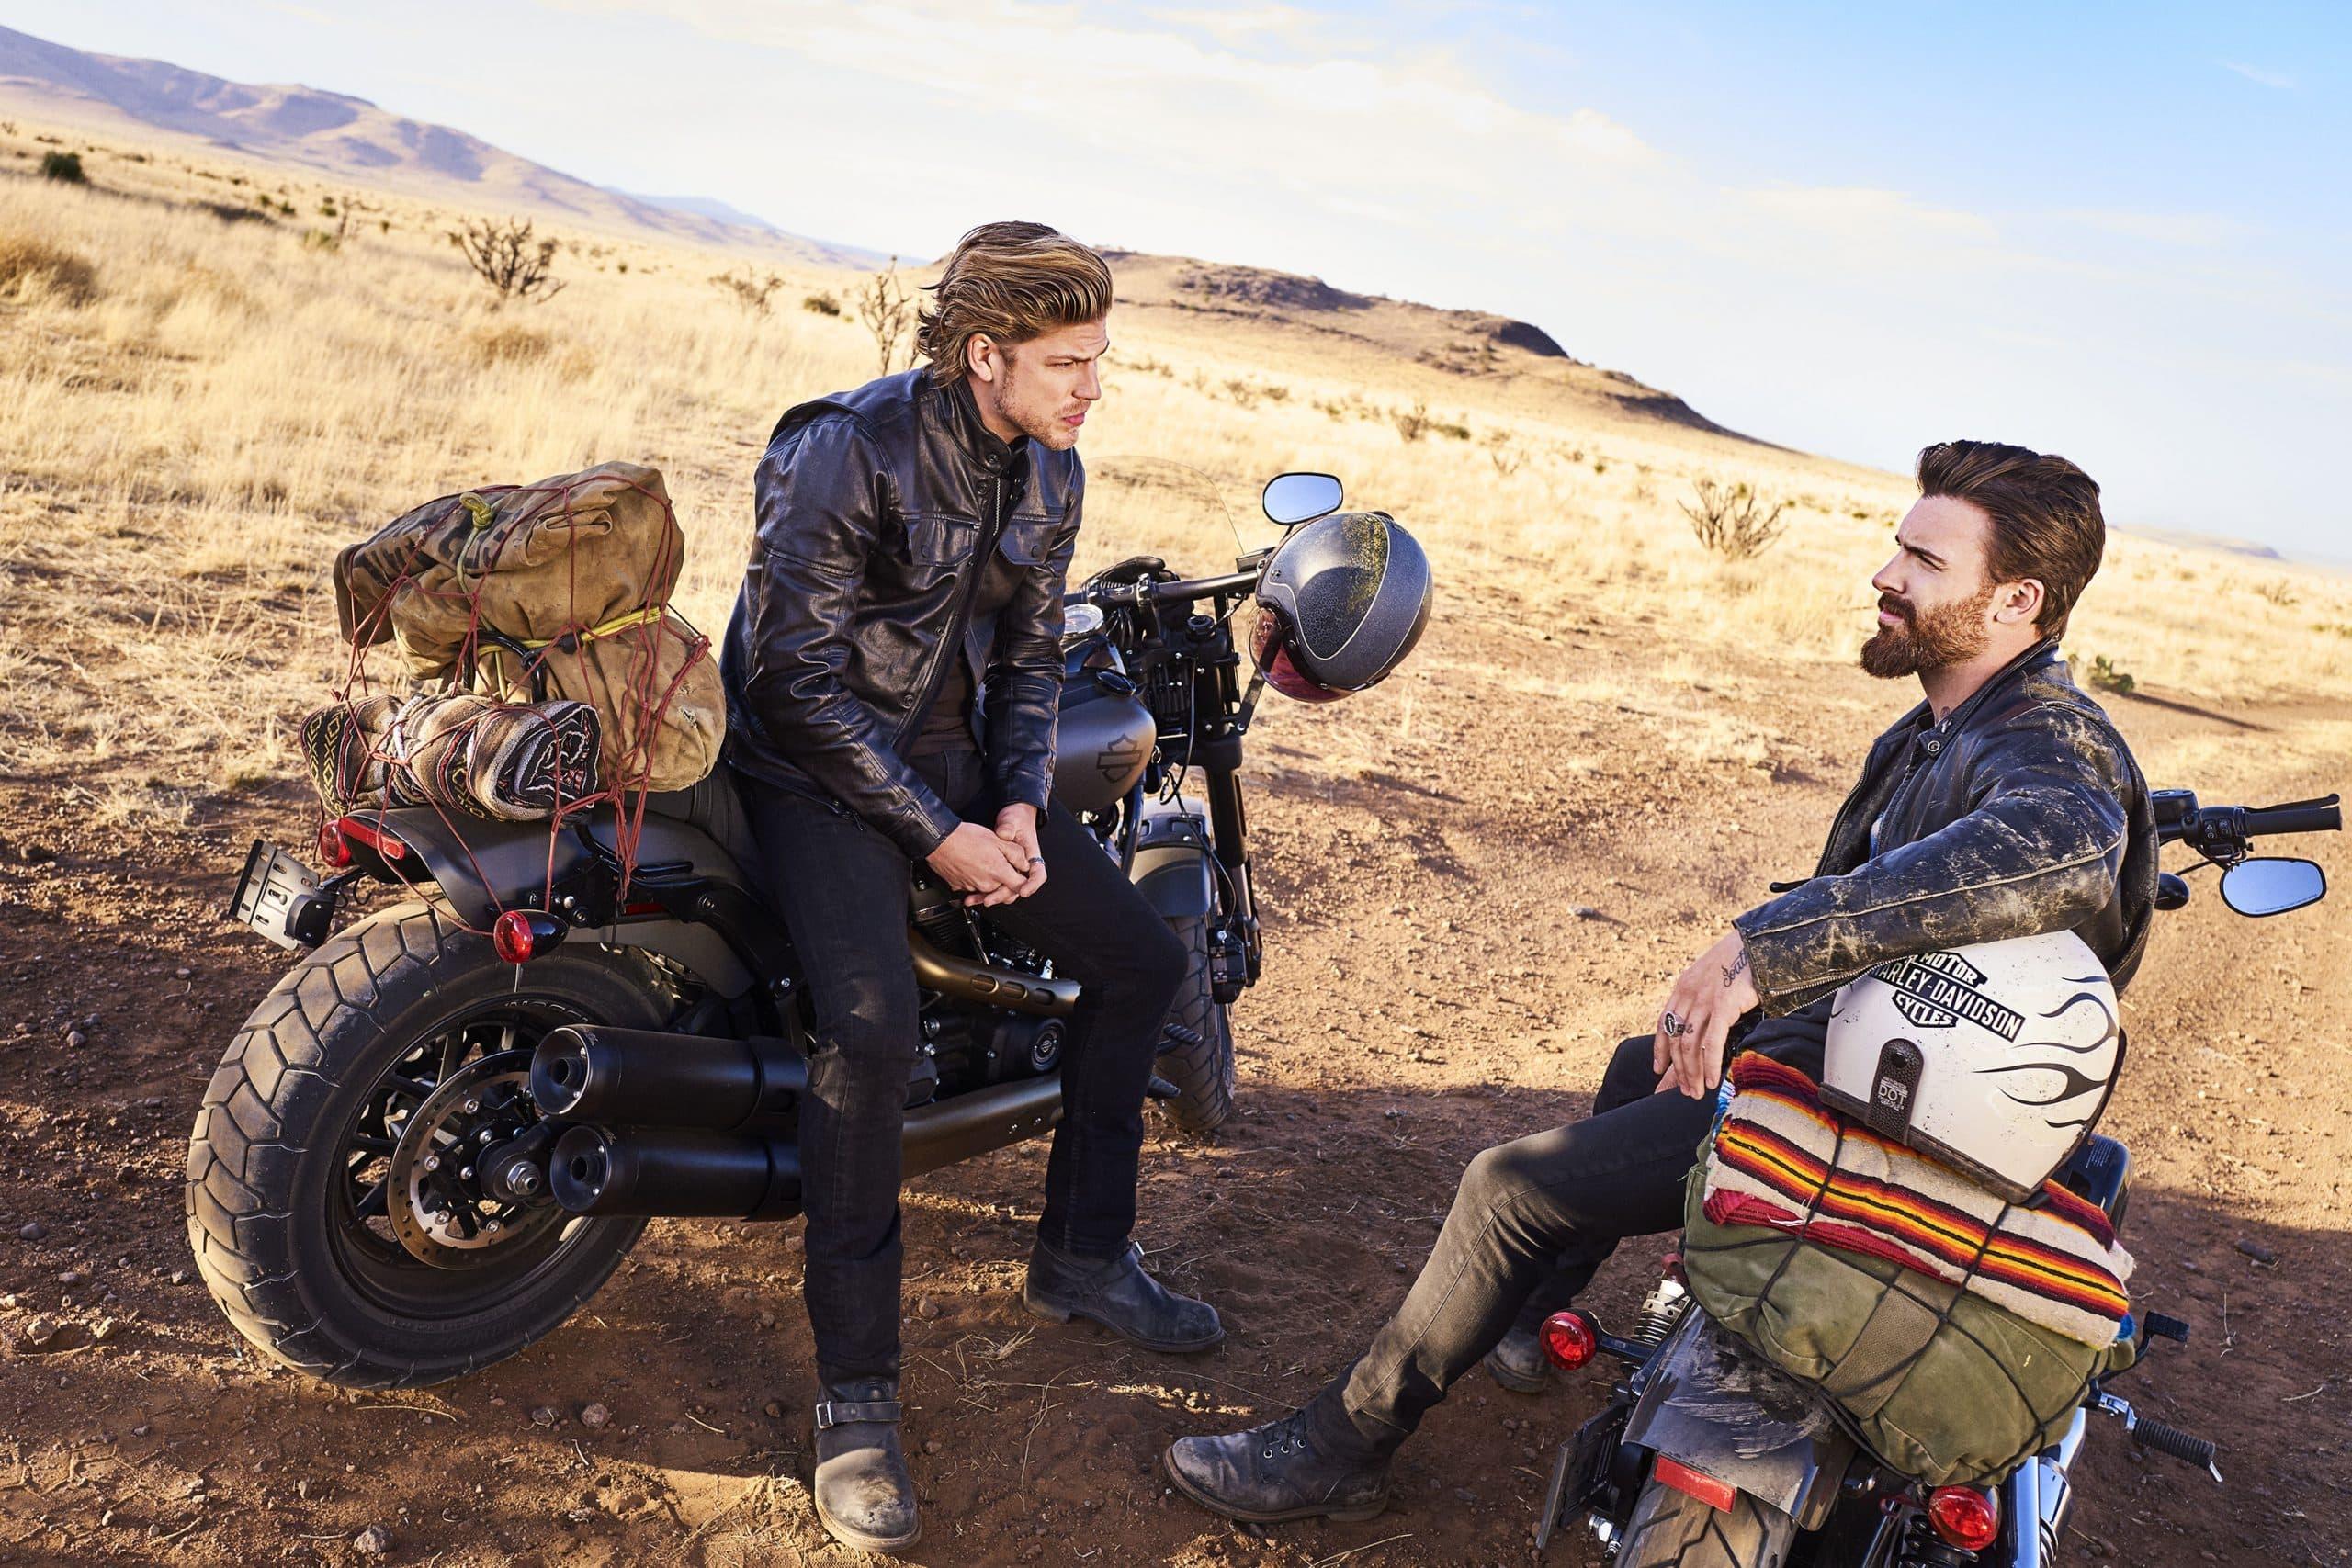 American Crew Harley Davidson 10 scaled